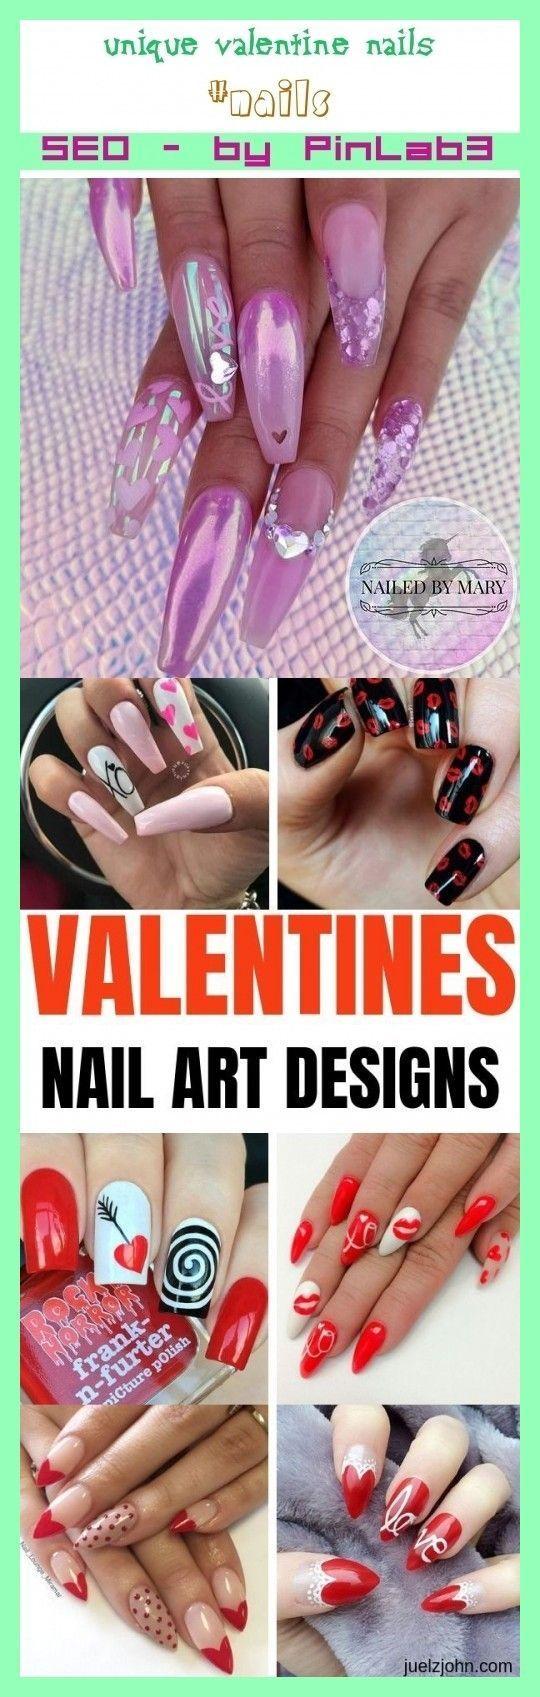 Unique valentine nails #nails #keywords #niches #seo #beauty. valentine nails acrylic, valentine nails designs, valentine nails coffin, valentine nails with gems, valentine nails easy, valentine nails gel, valentine nails pink, valentine nails red, valentine nails simple, valentine nails glitter, valentine nails dip powder, valentine nails stiletto, valentine nails shellac, valentine nails french, rose gold valentine nails, valentine nails almond, valentine nail. #valentines day nails gel almond